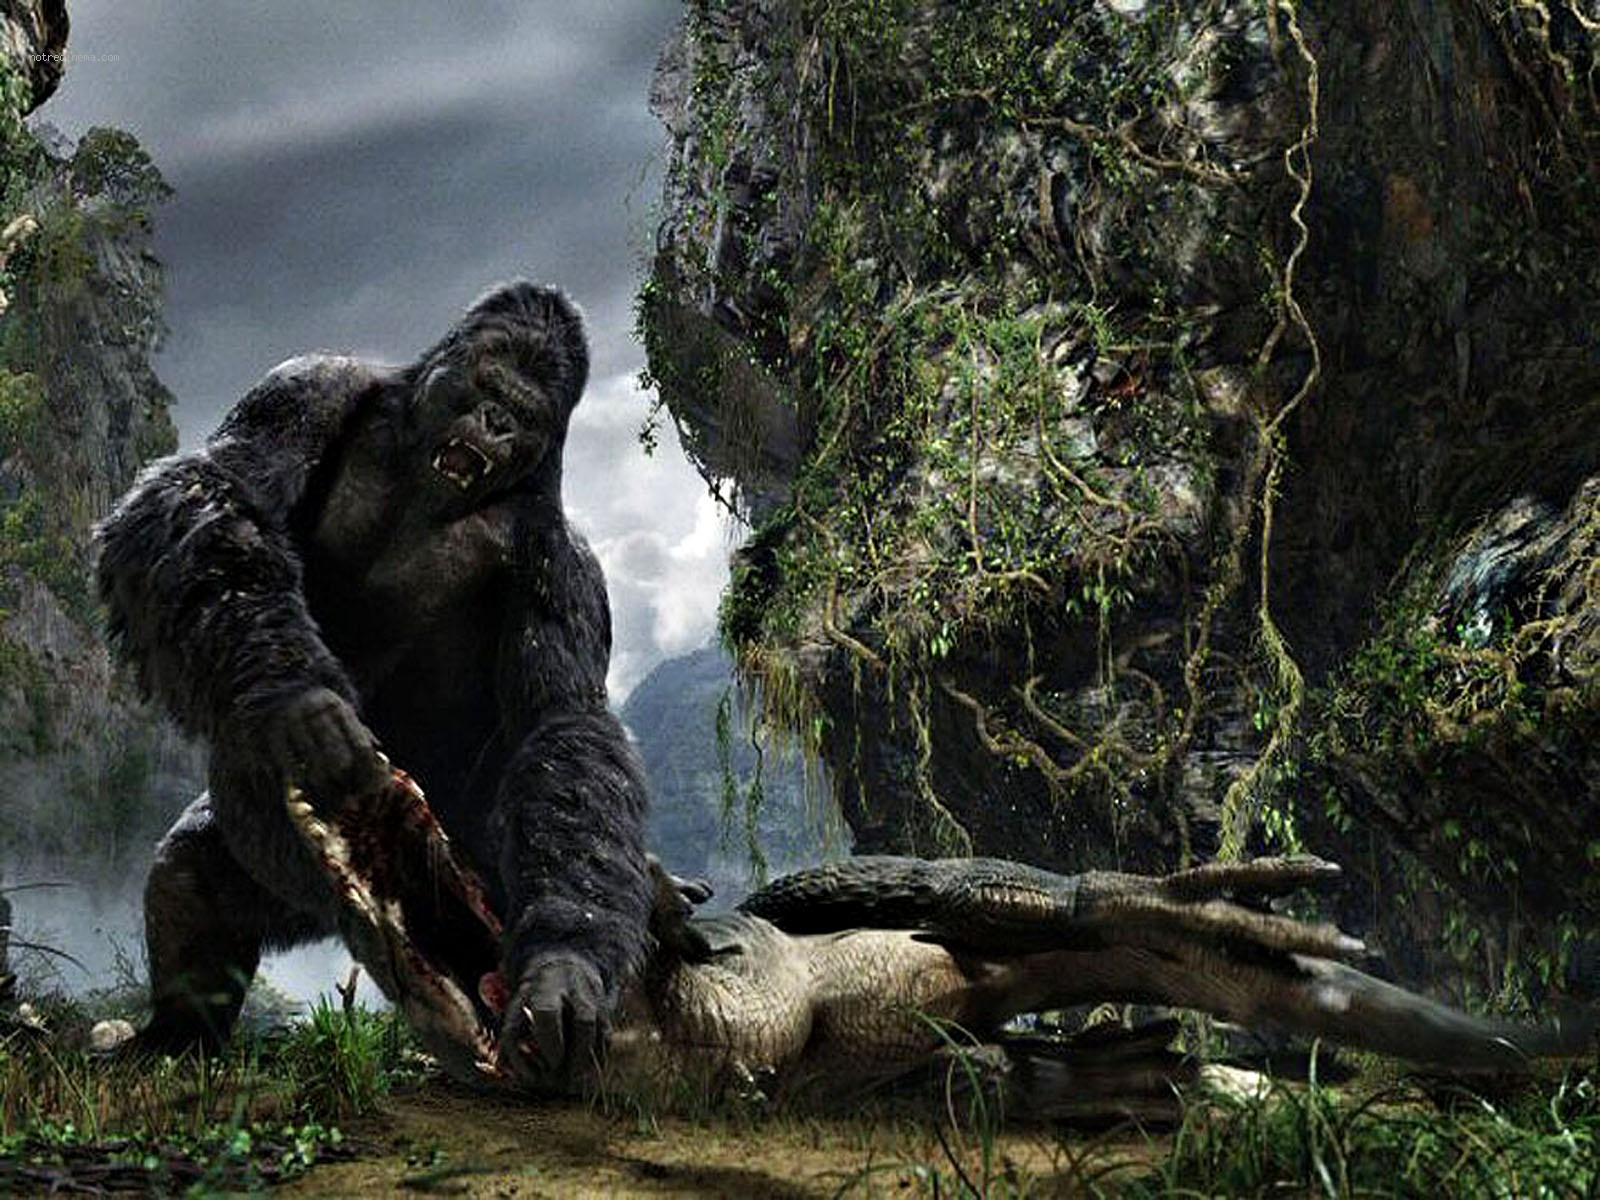 King Kong Wallpaper And Screensavers on Planet Wallpaper Hd 1280x1024